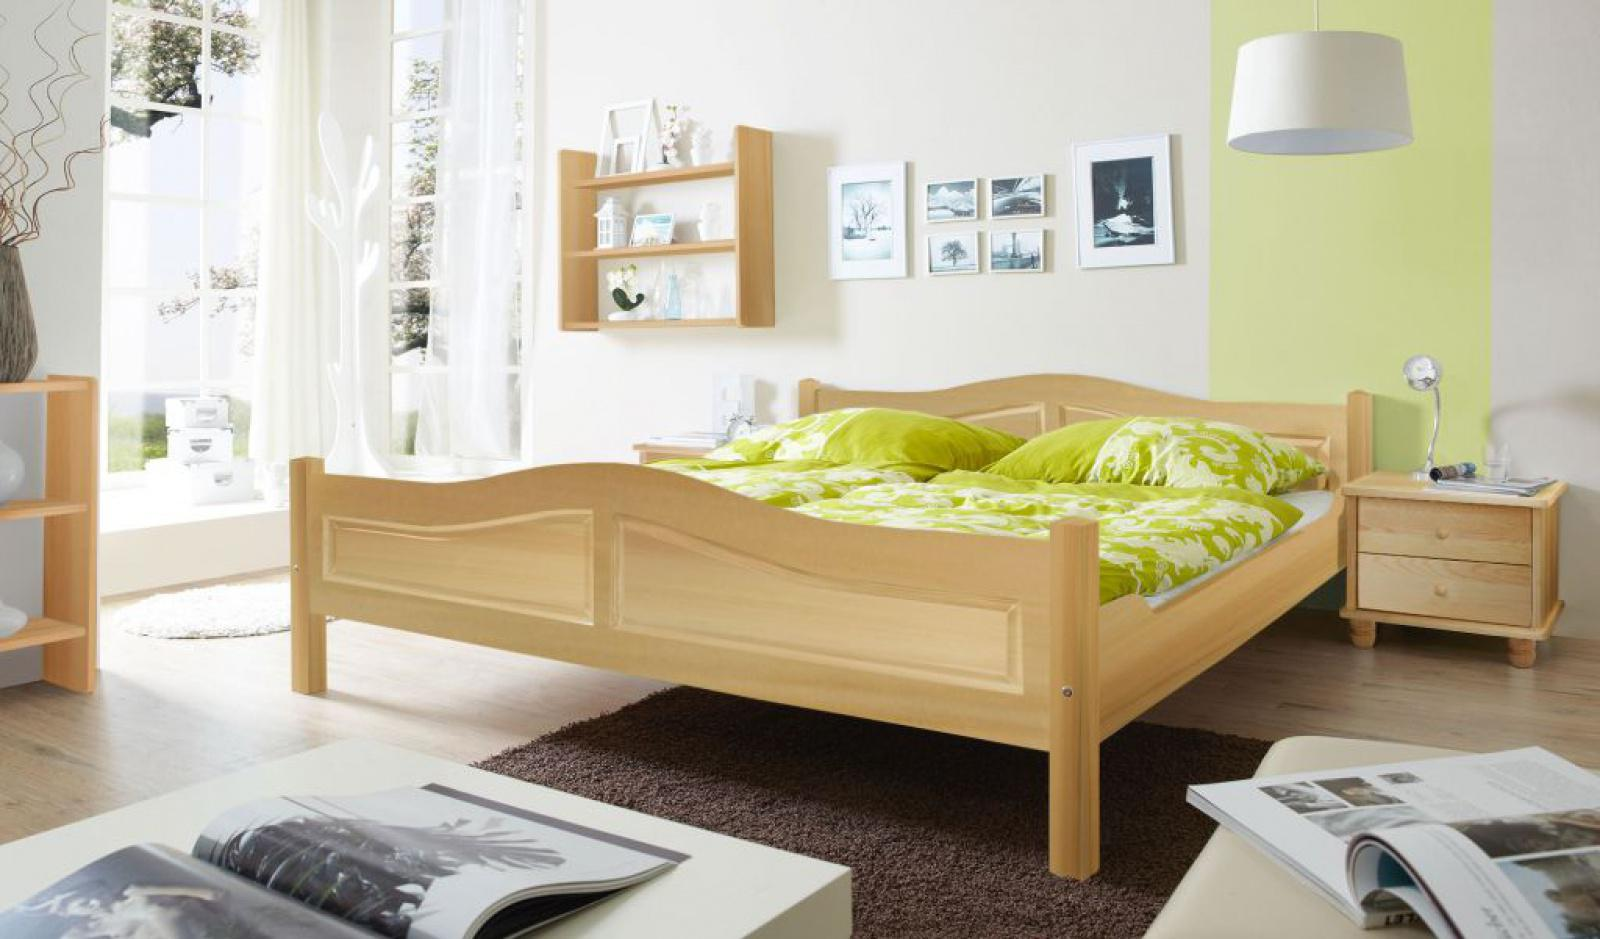 Doppelbett rita 140 x 200 natur kaufen bei m bel lux for Doppelbett 140